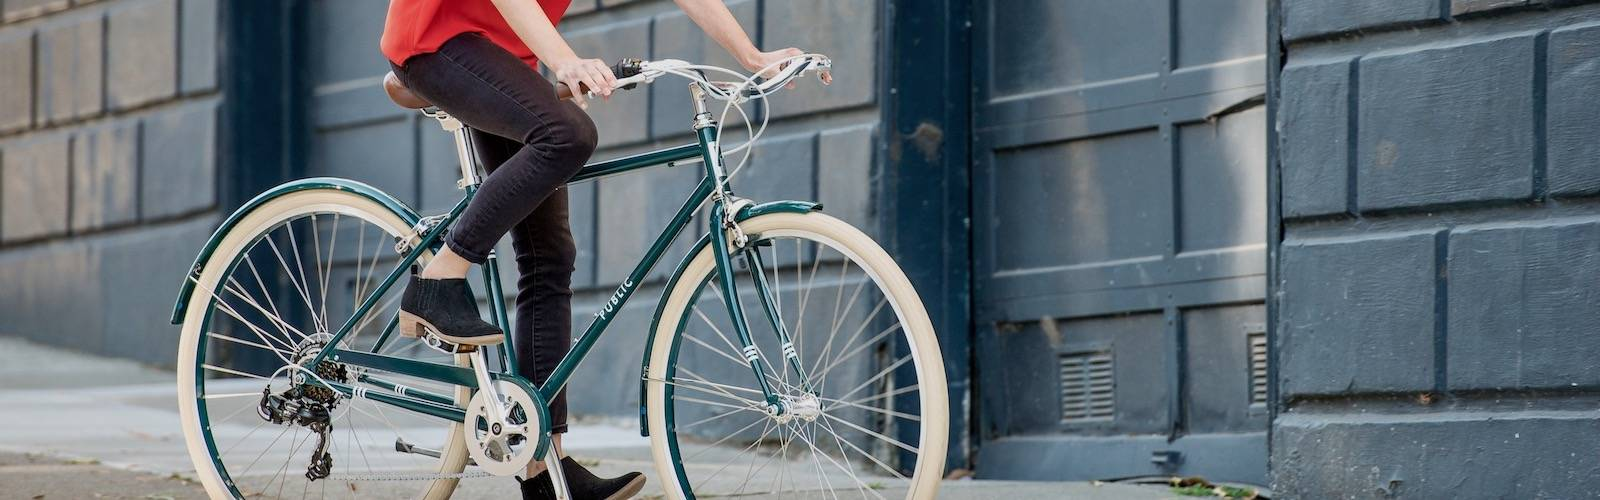 Beach cruiser bikes available at Mike's Bikes!